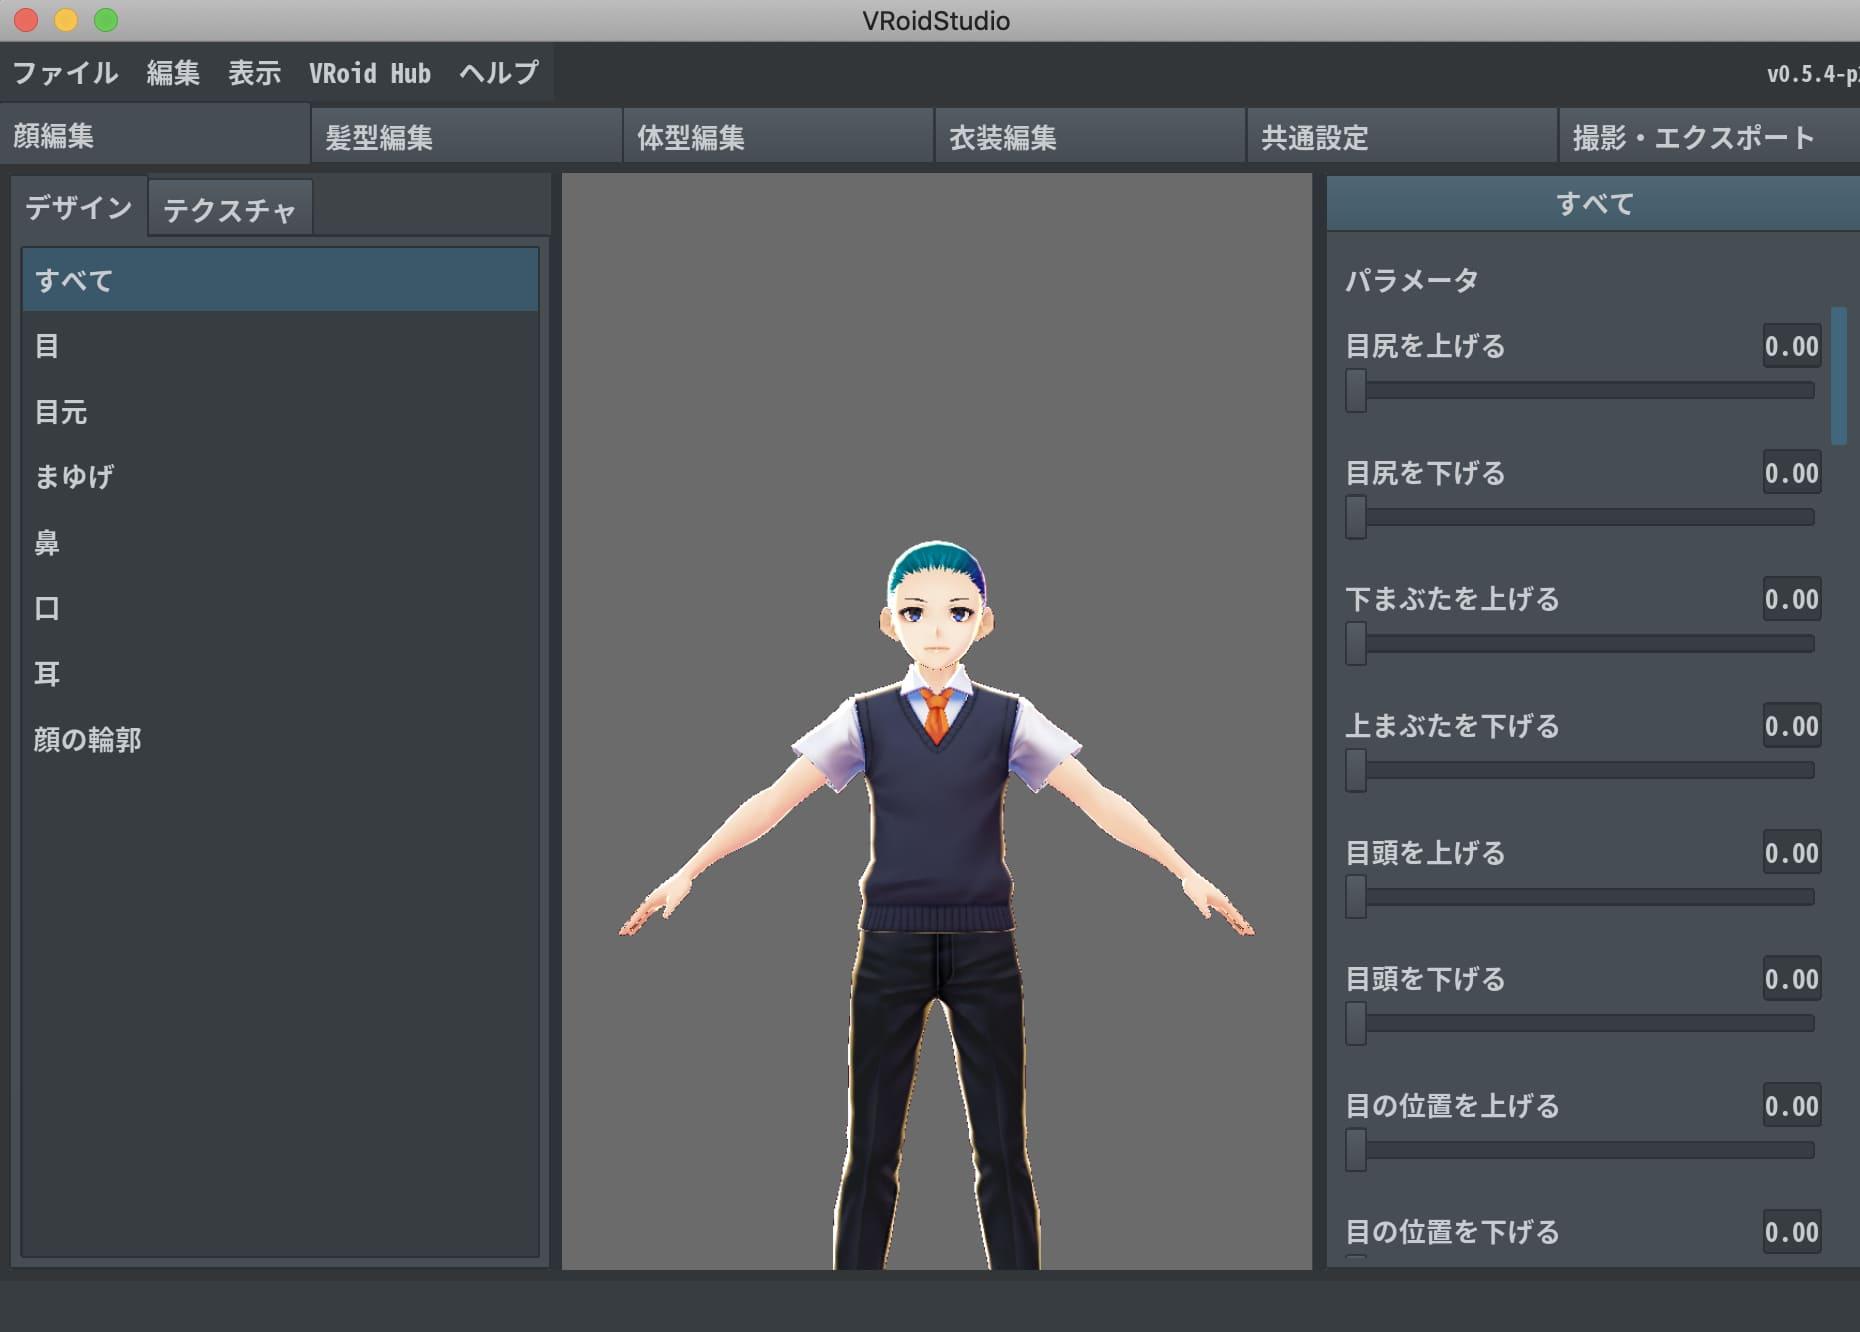 VRoidStudioで新規キャラクターを編集する